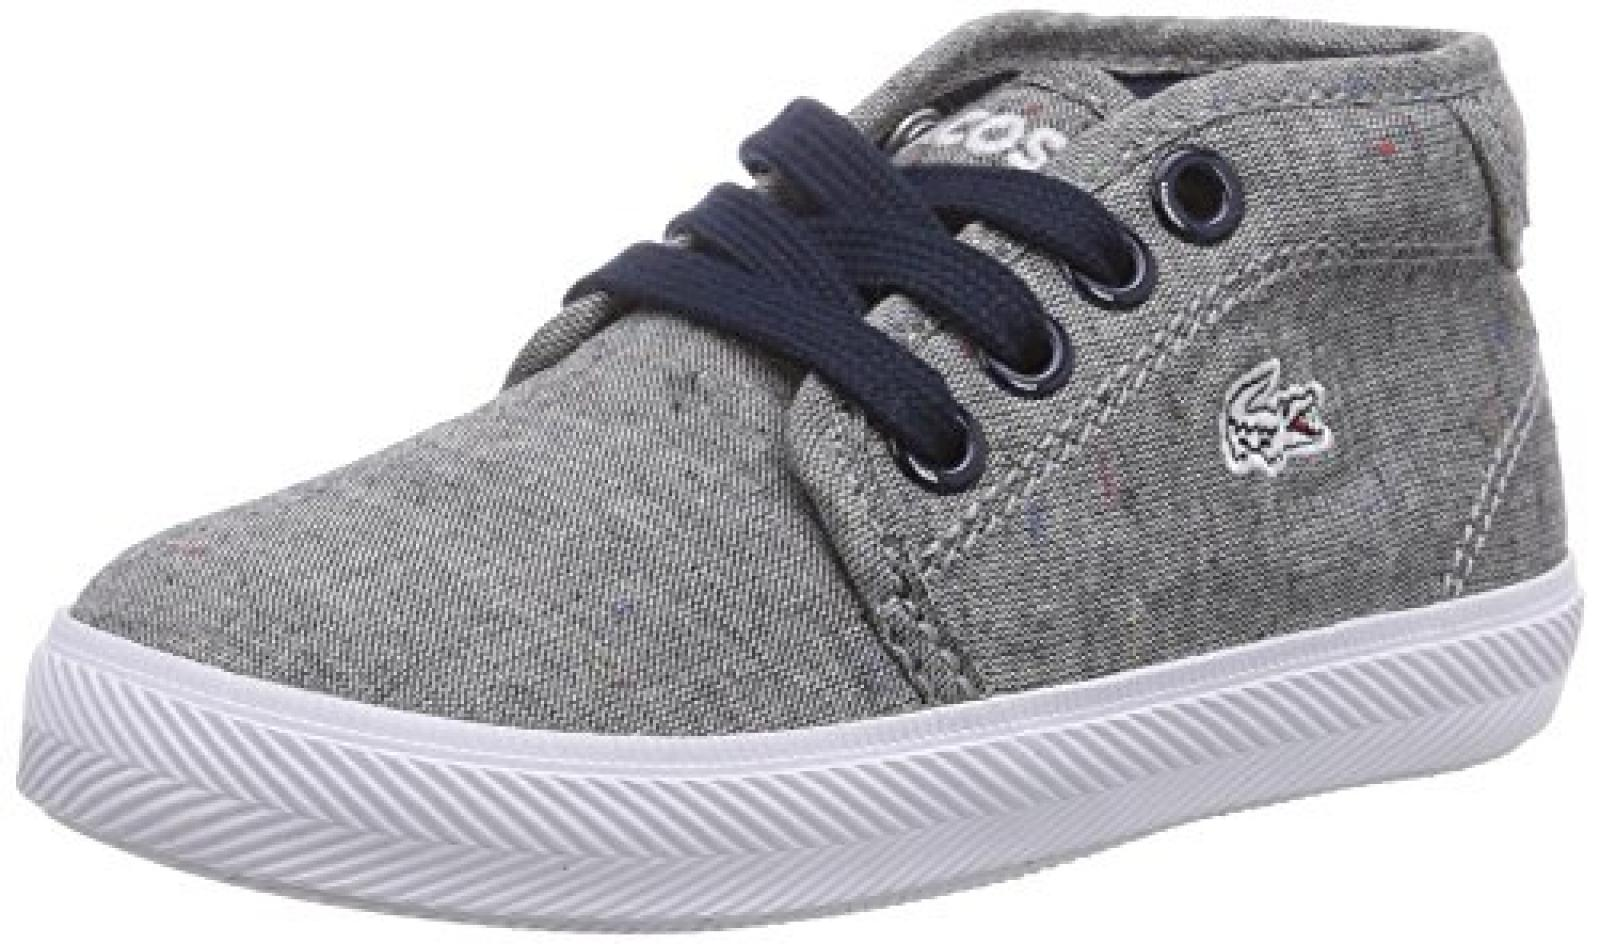 Lacoste AMPTHILL SEG2 Unisex-Kinder Hohe Sneakers